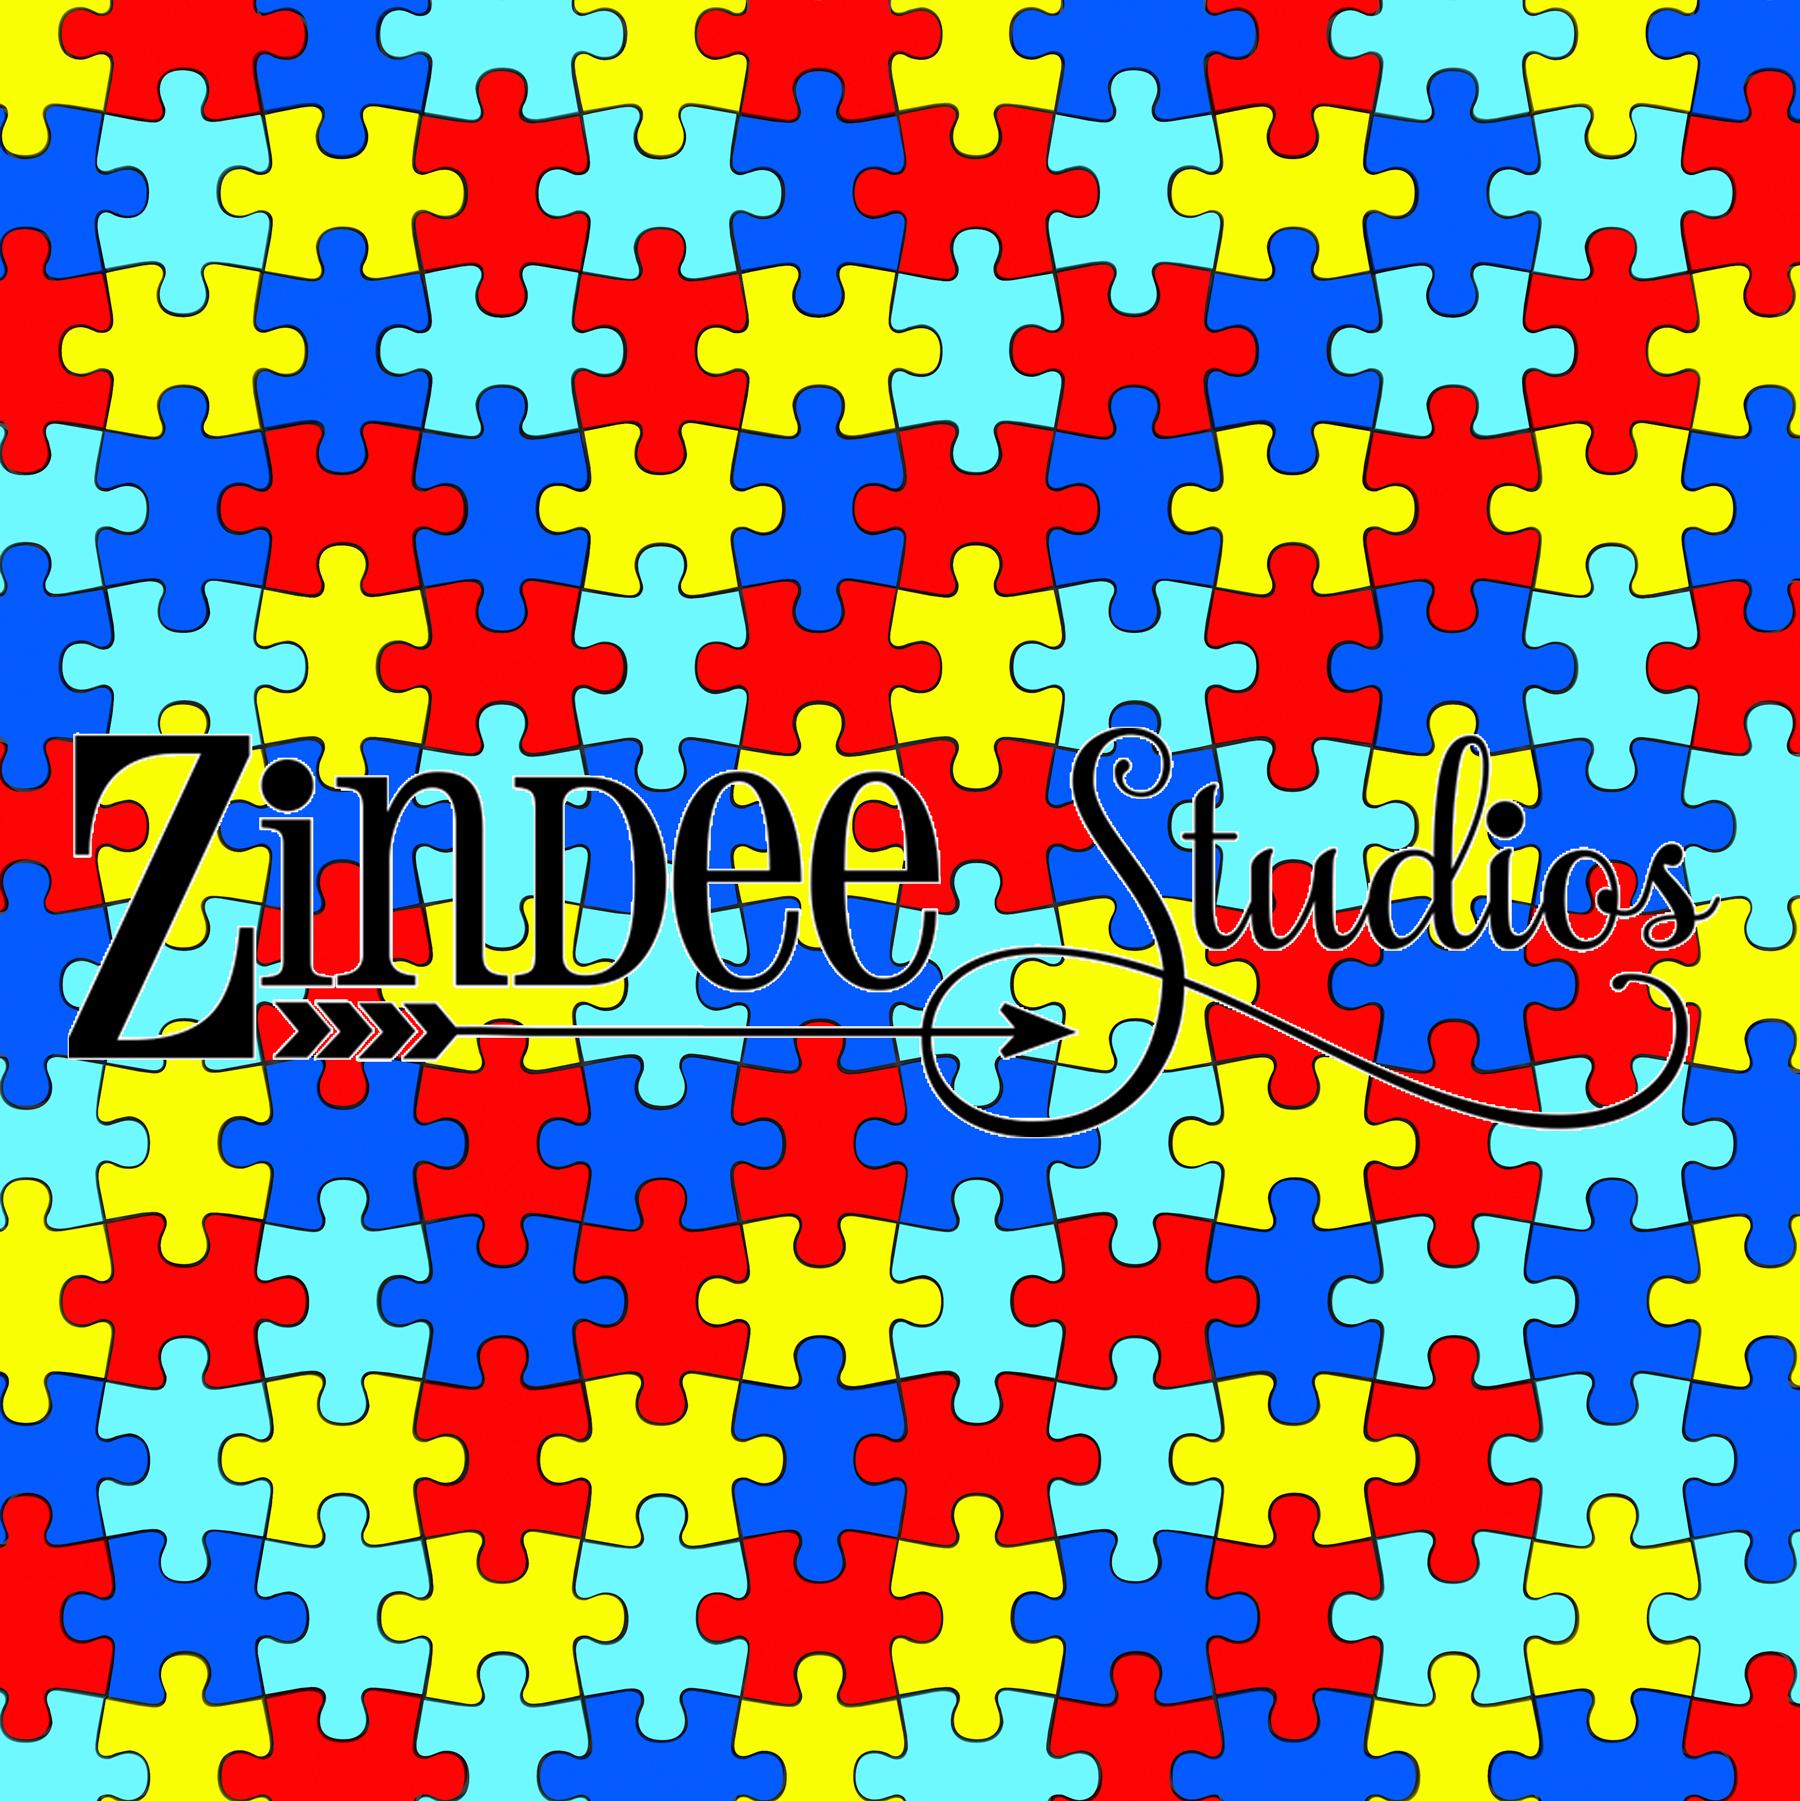 Autism Puzzle Piece – Zindee Studios - Puzzle Print Htv